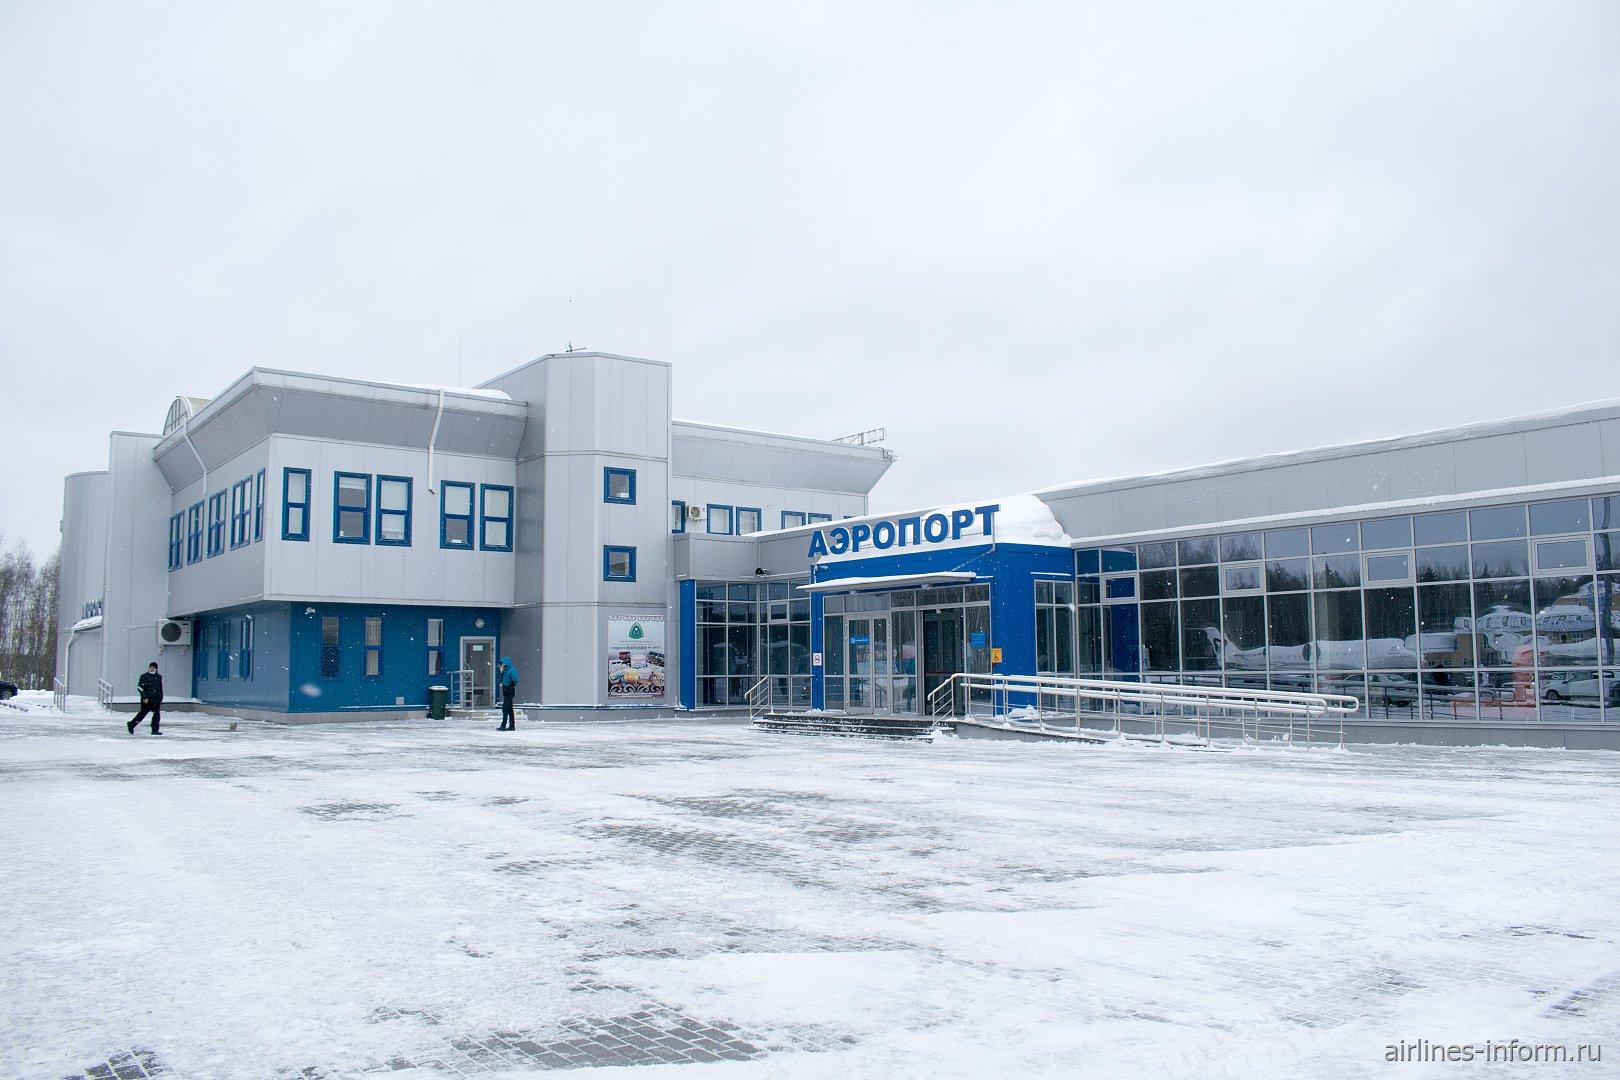 Вход в аэровокзал аэропорта Череповец